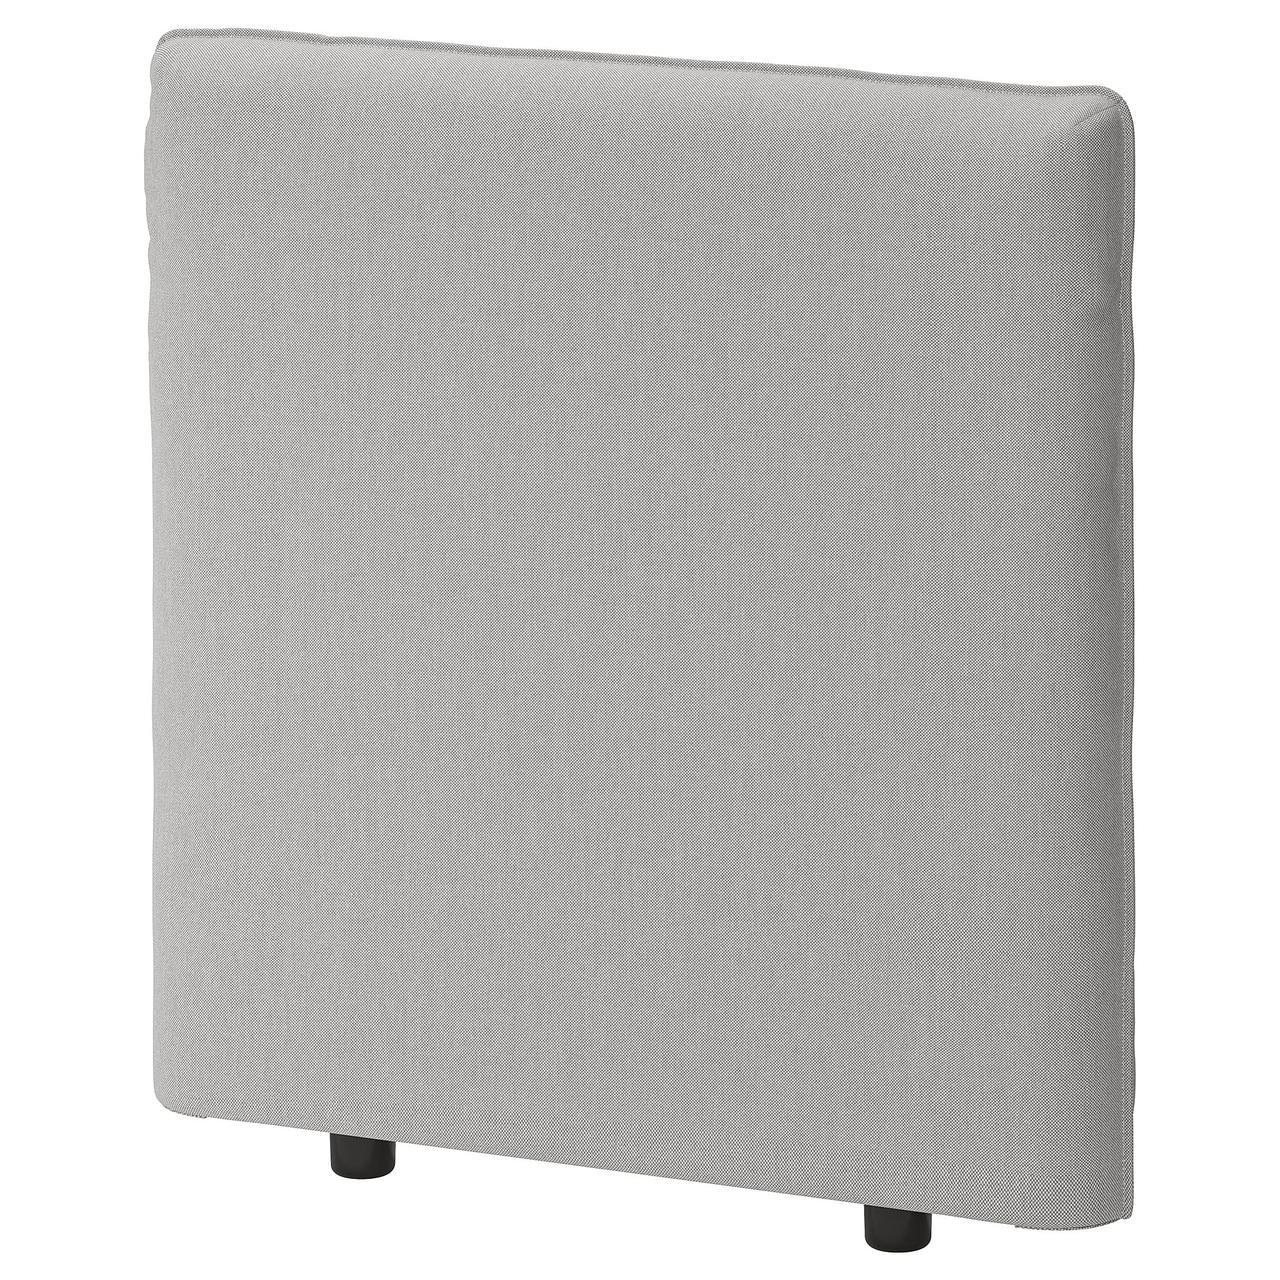 IKEA VALLENTUNA ( 591.495.89) Спинка 80x80 см